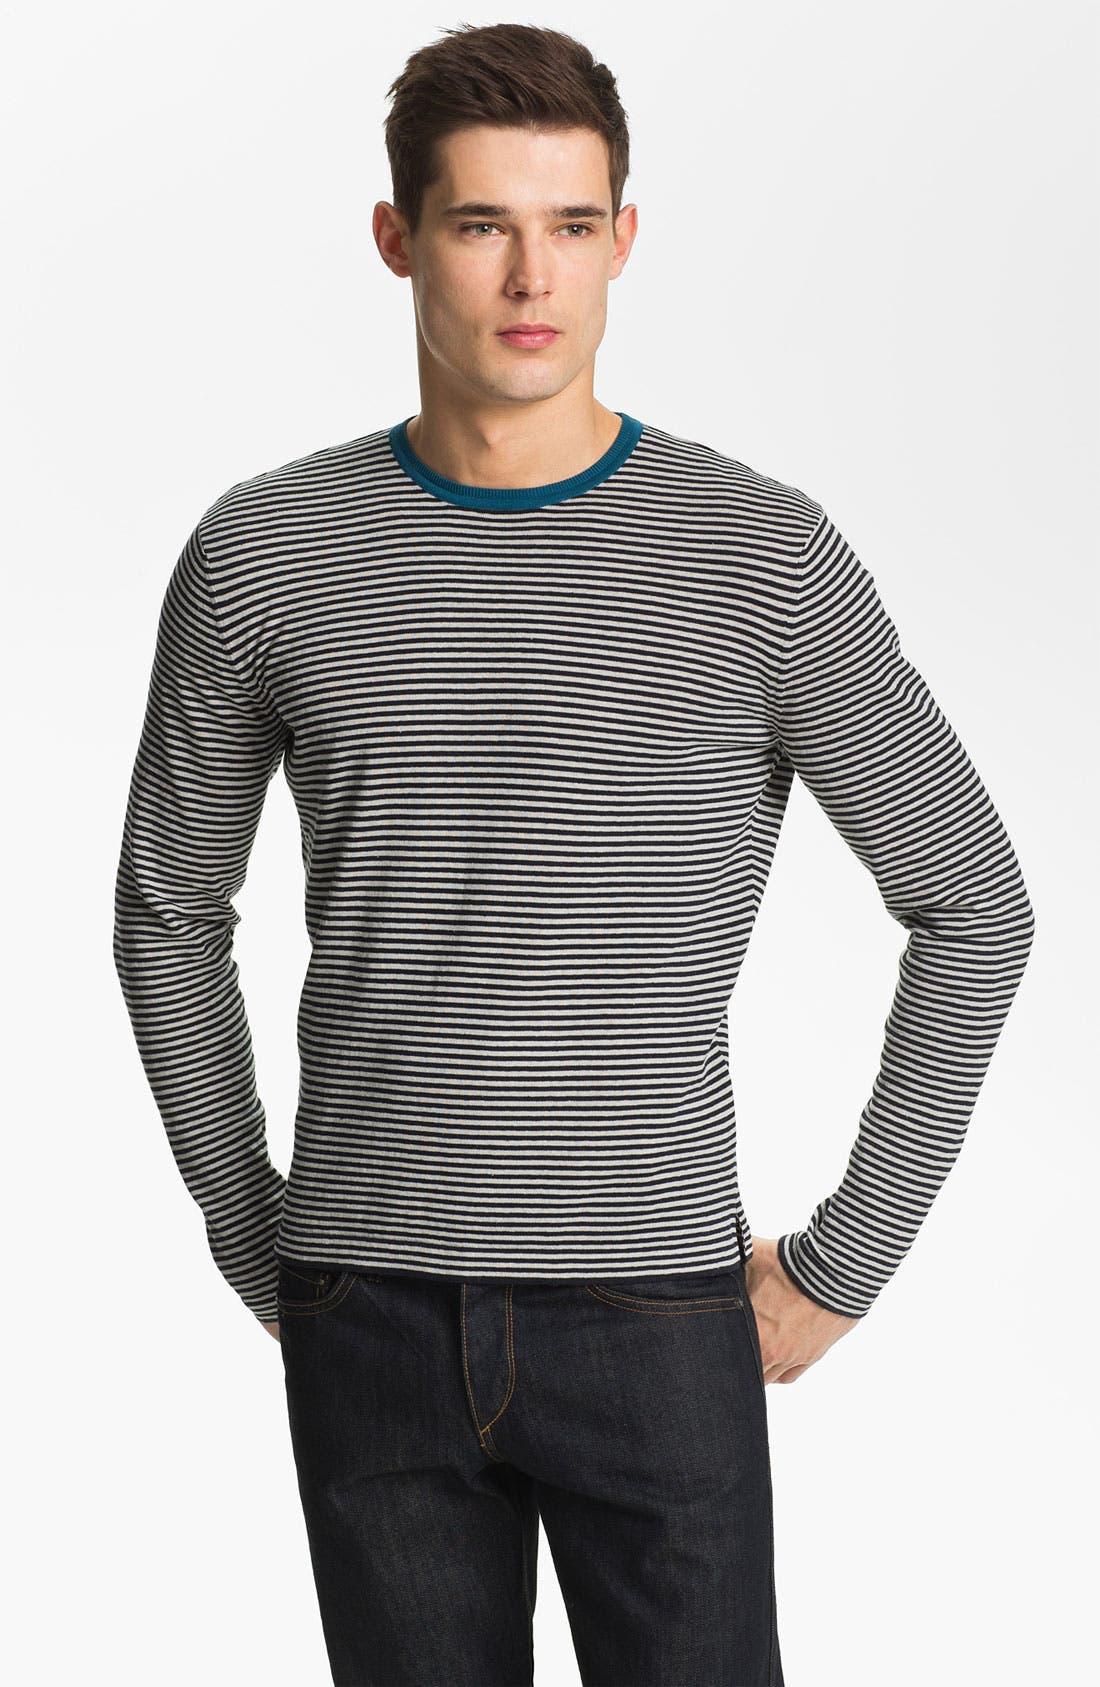 Alternate Image 1 Selected - Zegna Sport Crewneck Cotton & Linen Sweater